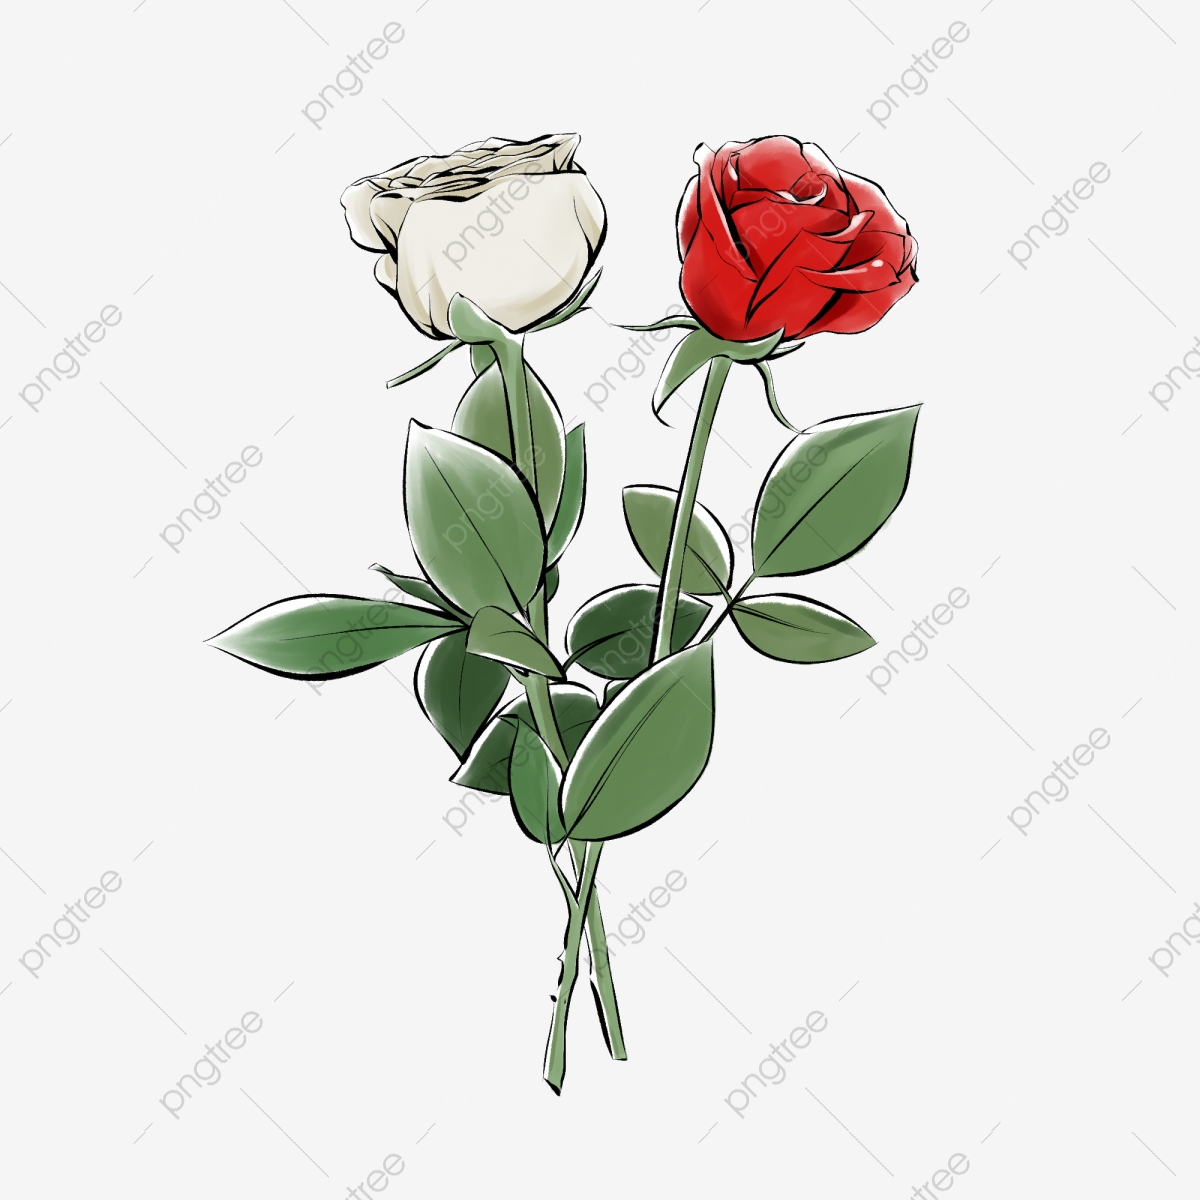 Mawar Gambar Bahan Bunga Cerah Bunga Cantik Bunga Dan Tumbuh